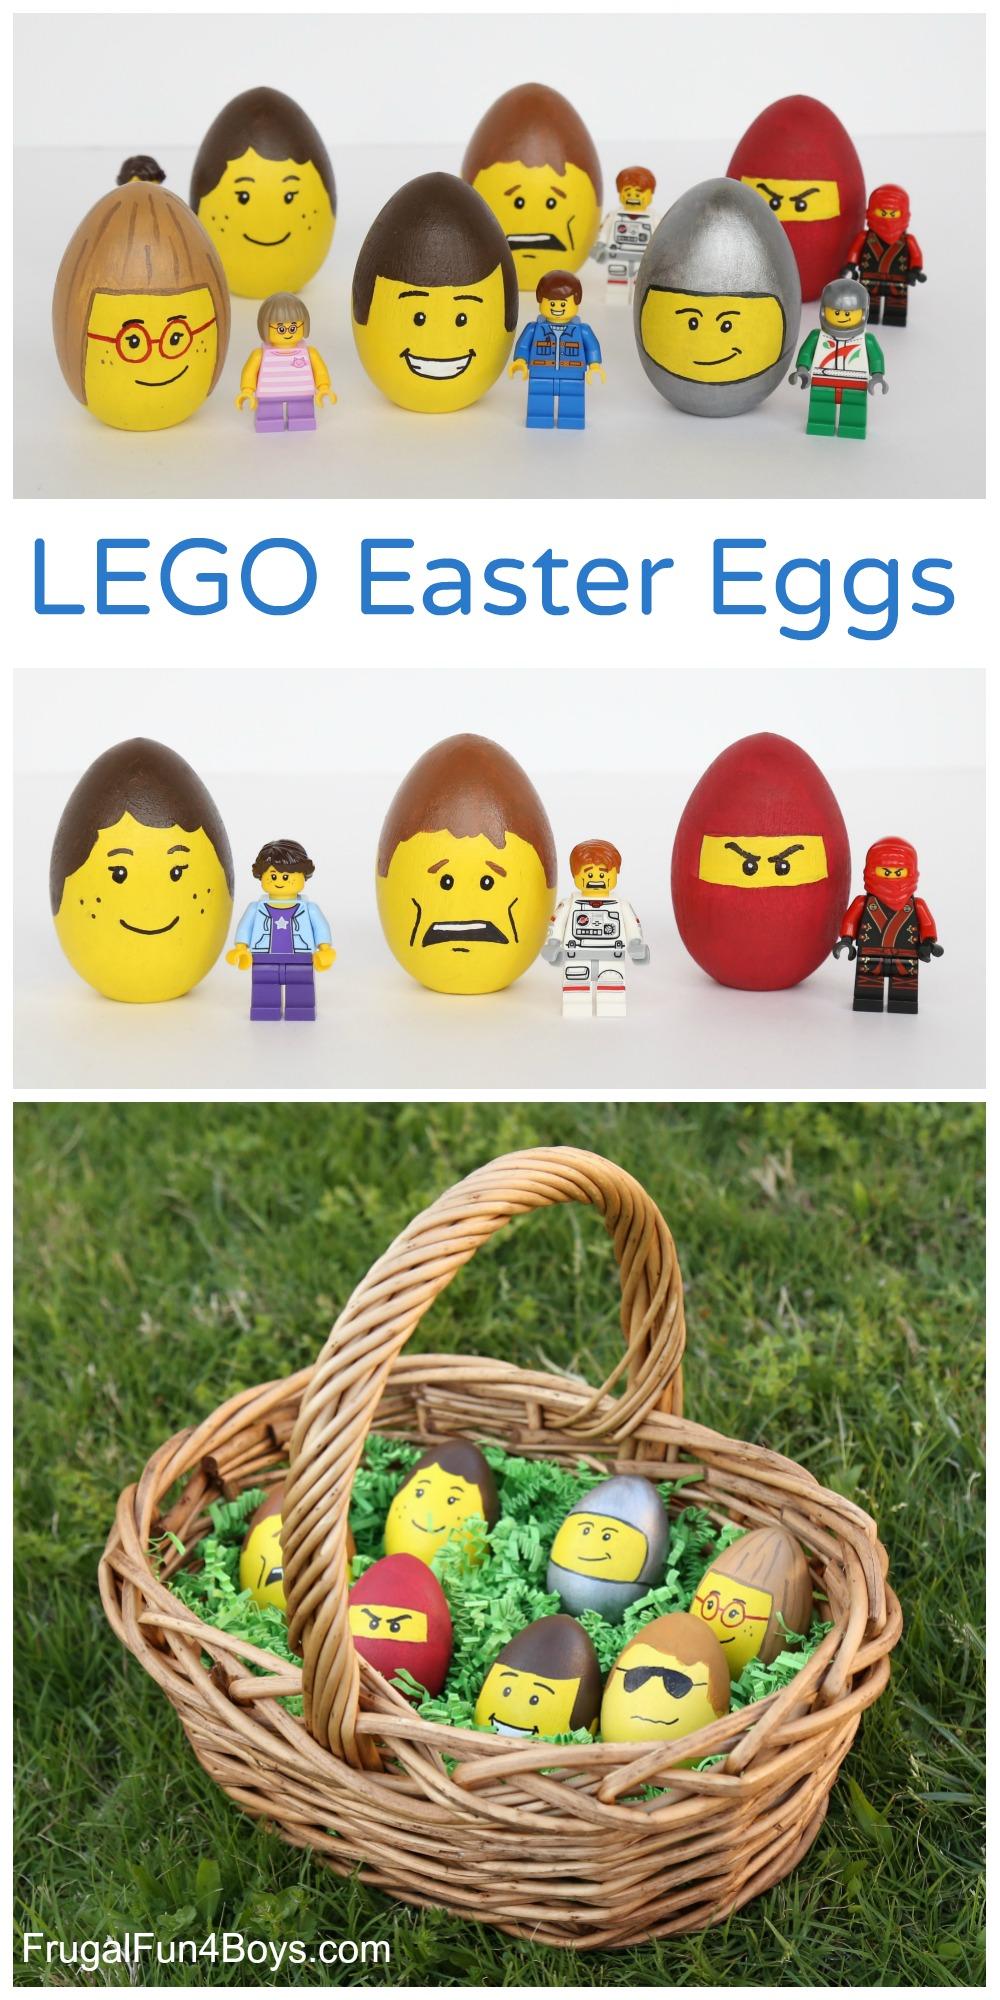 LEGO Minifigure Decorated Easter Eggs